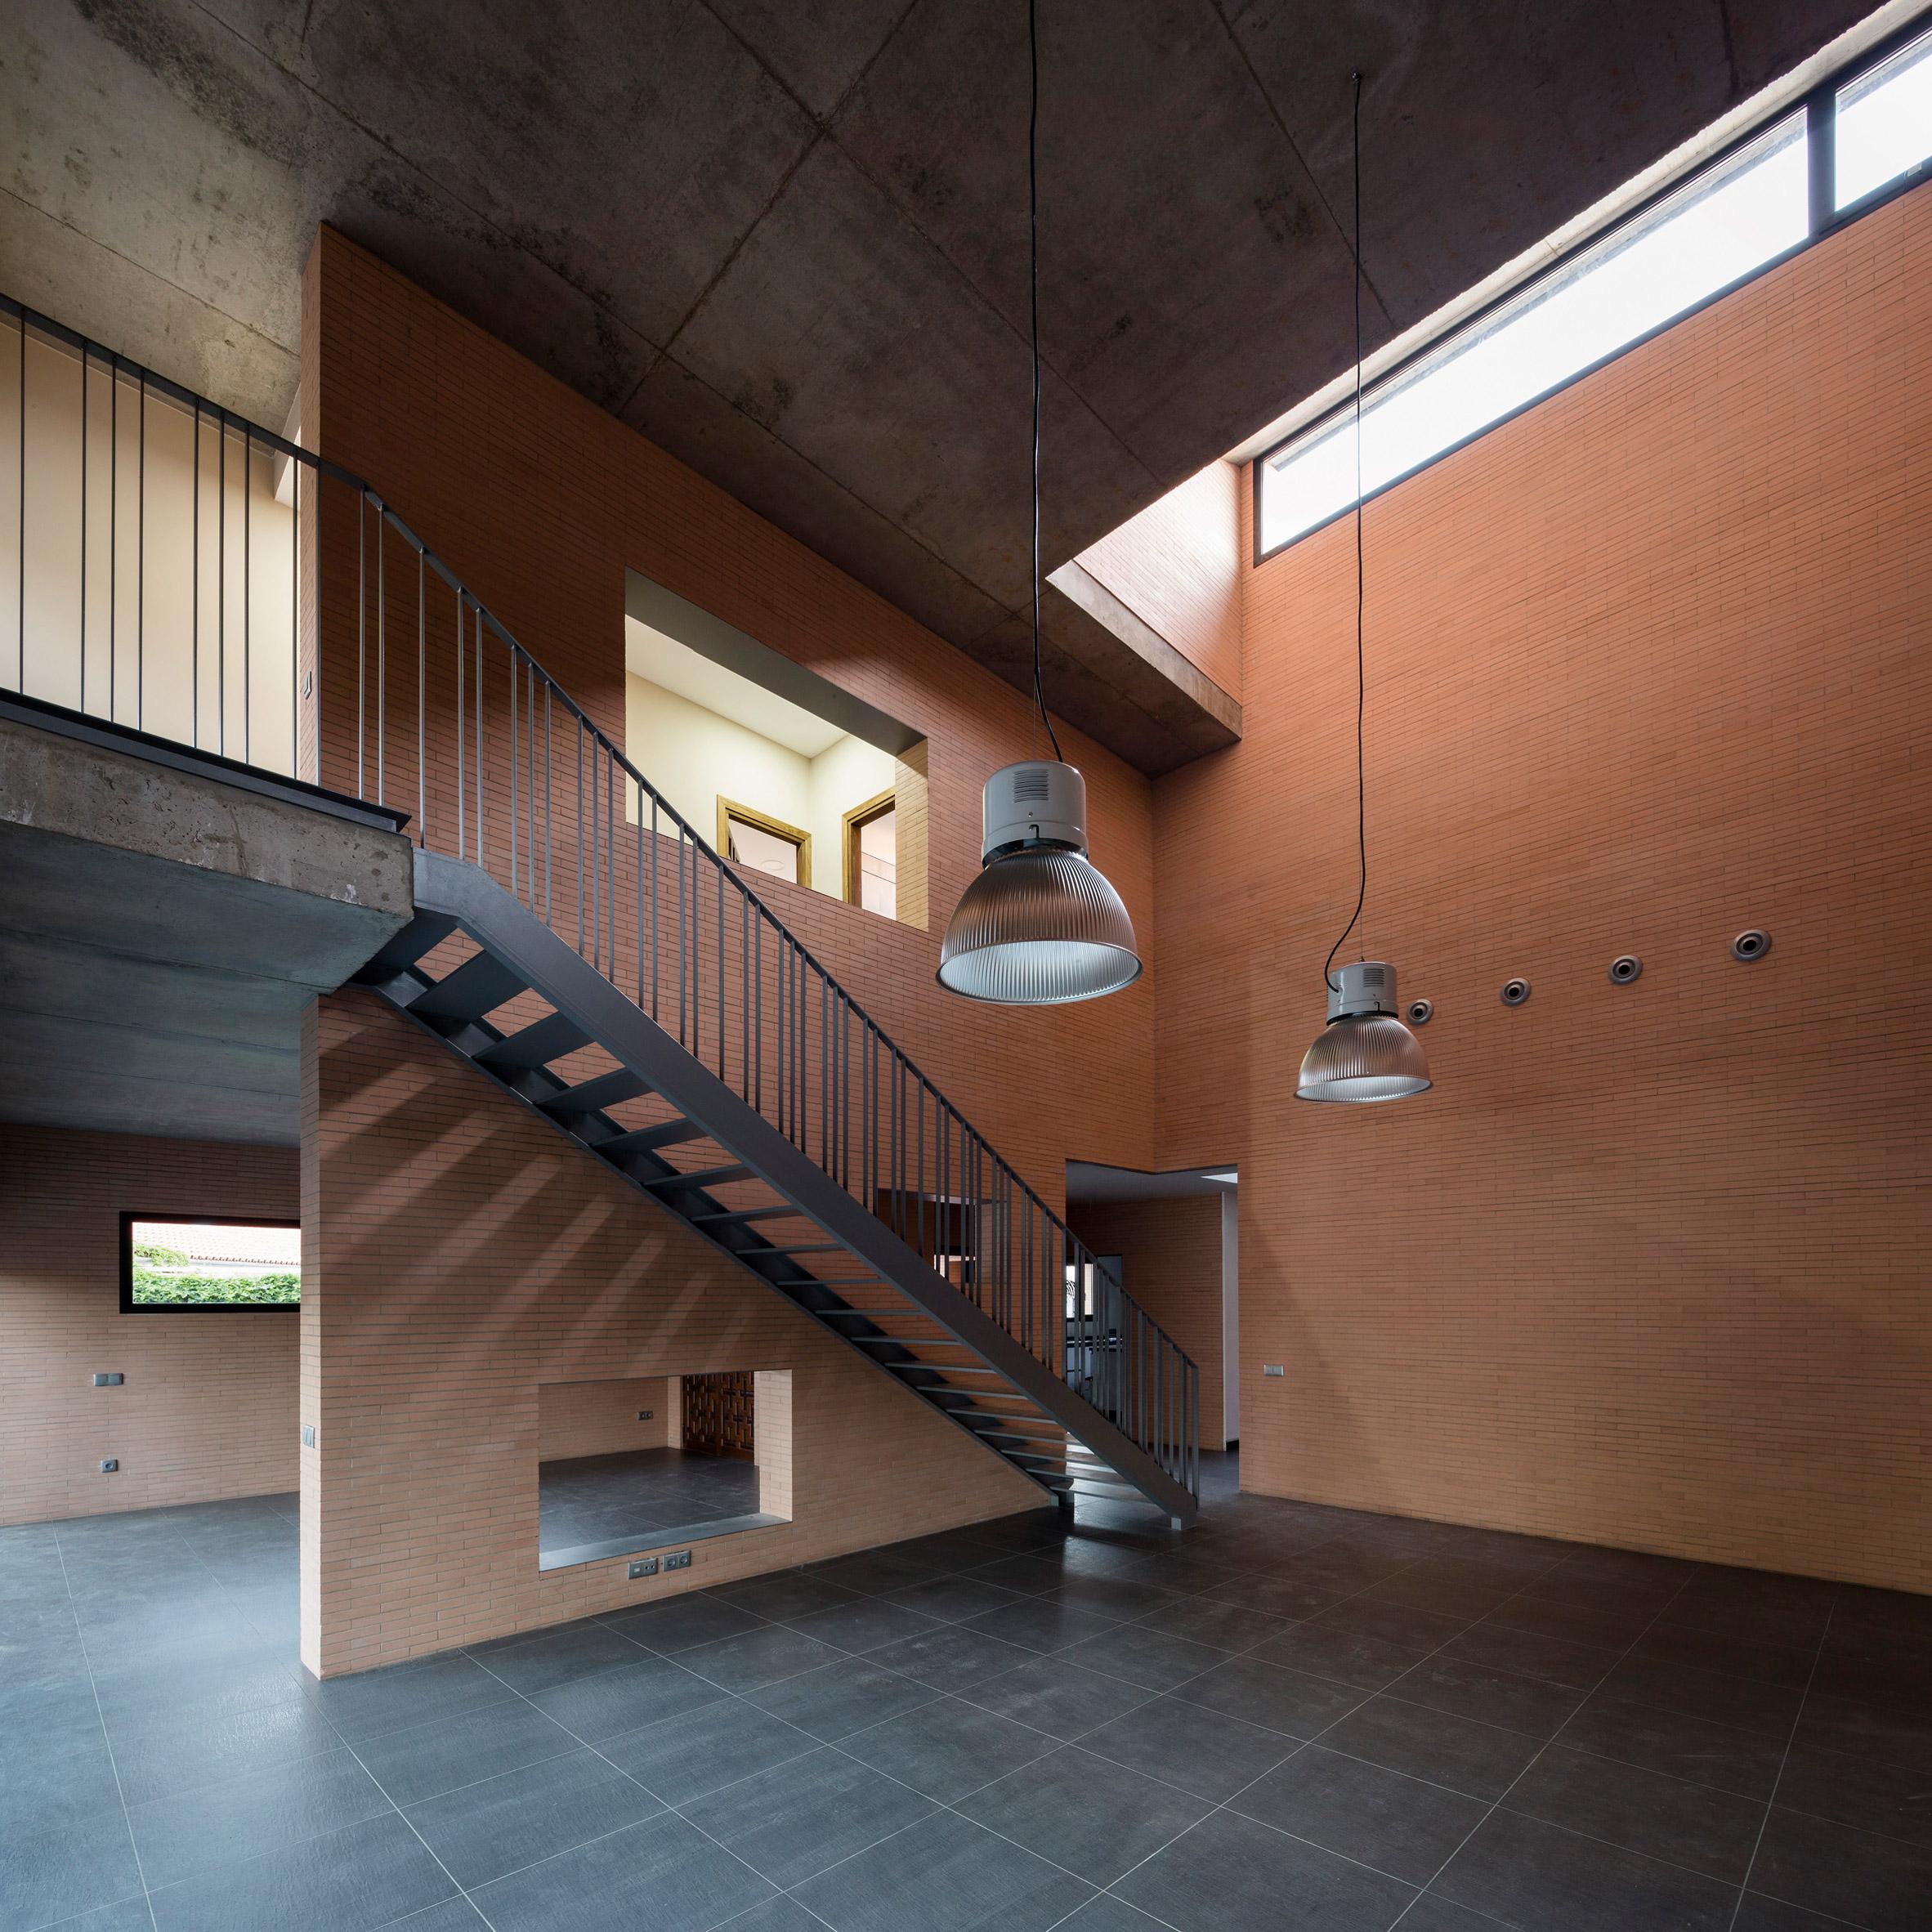 Perea Borobio House by Canales & Lombardero